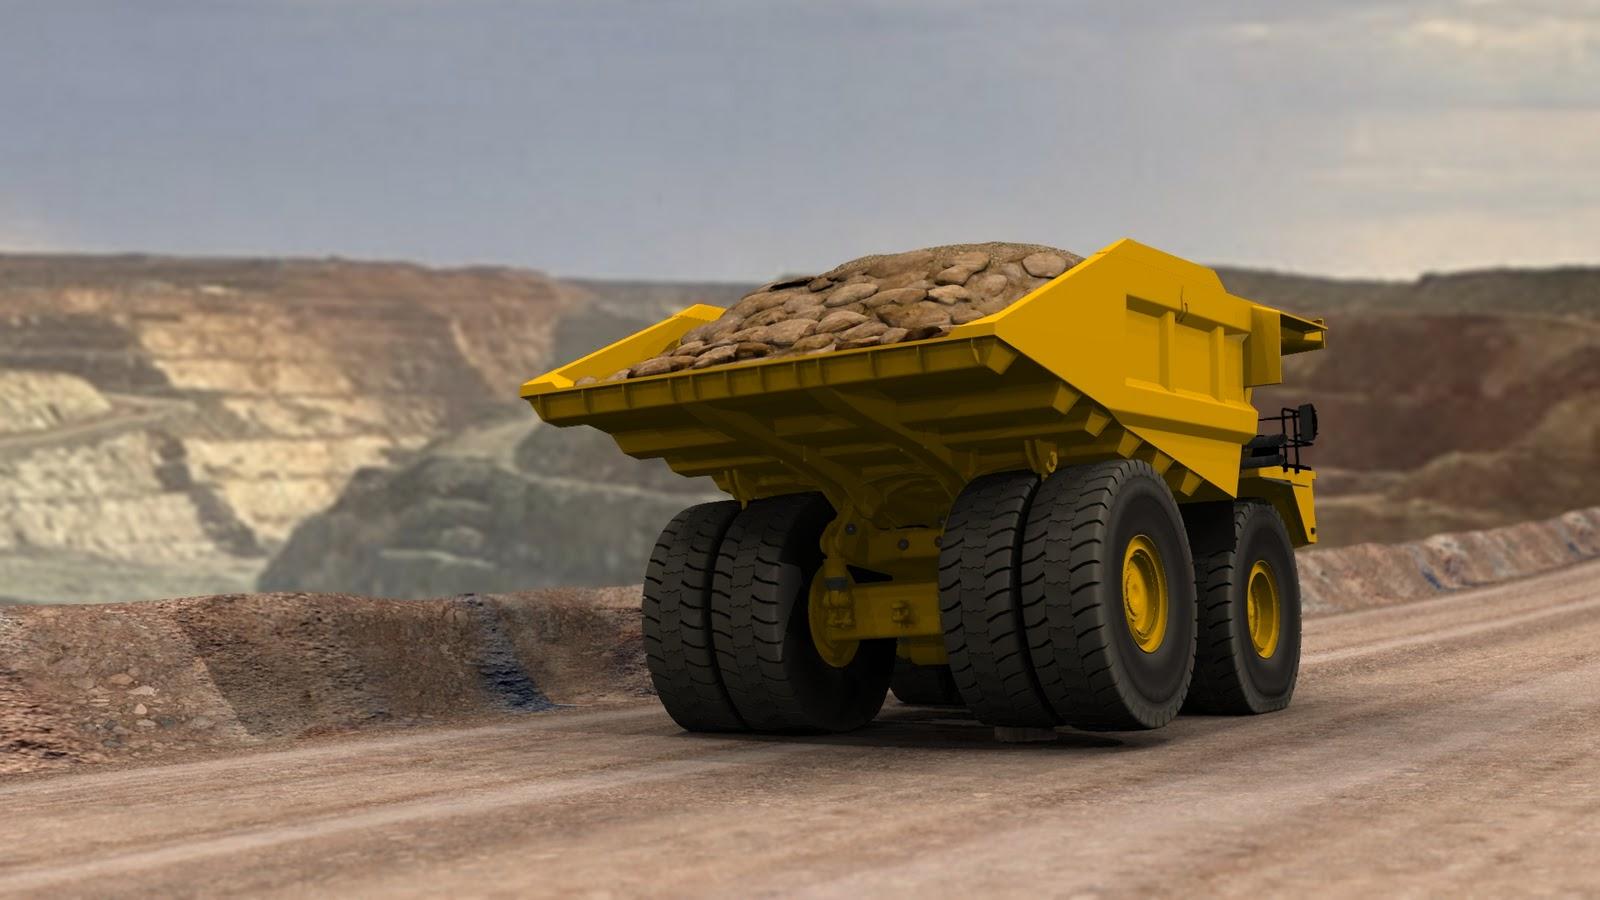 Etf mining trucks january 2011 - Mining images hd ...